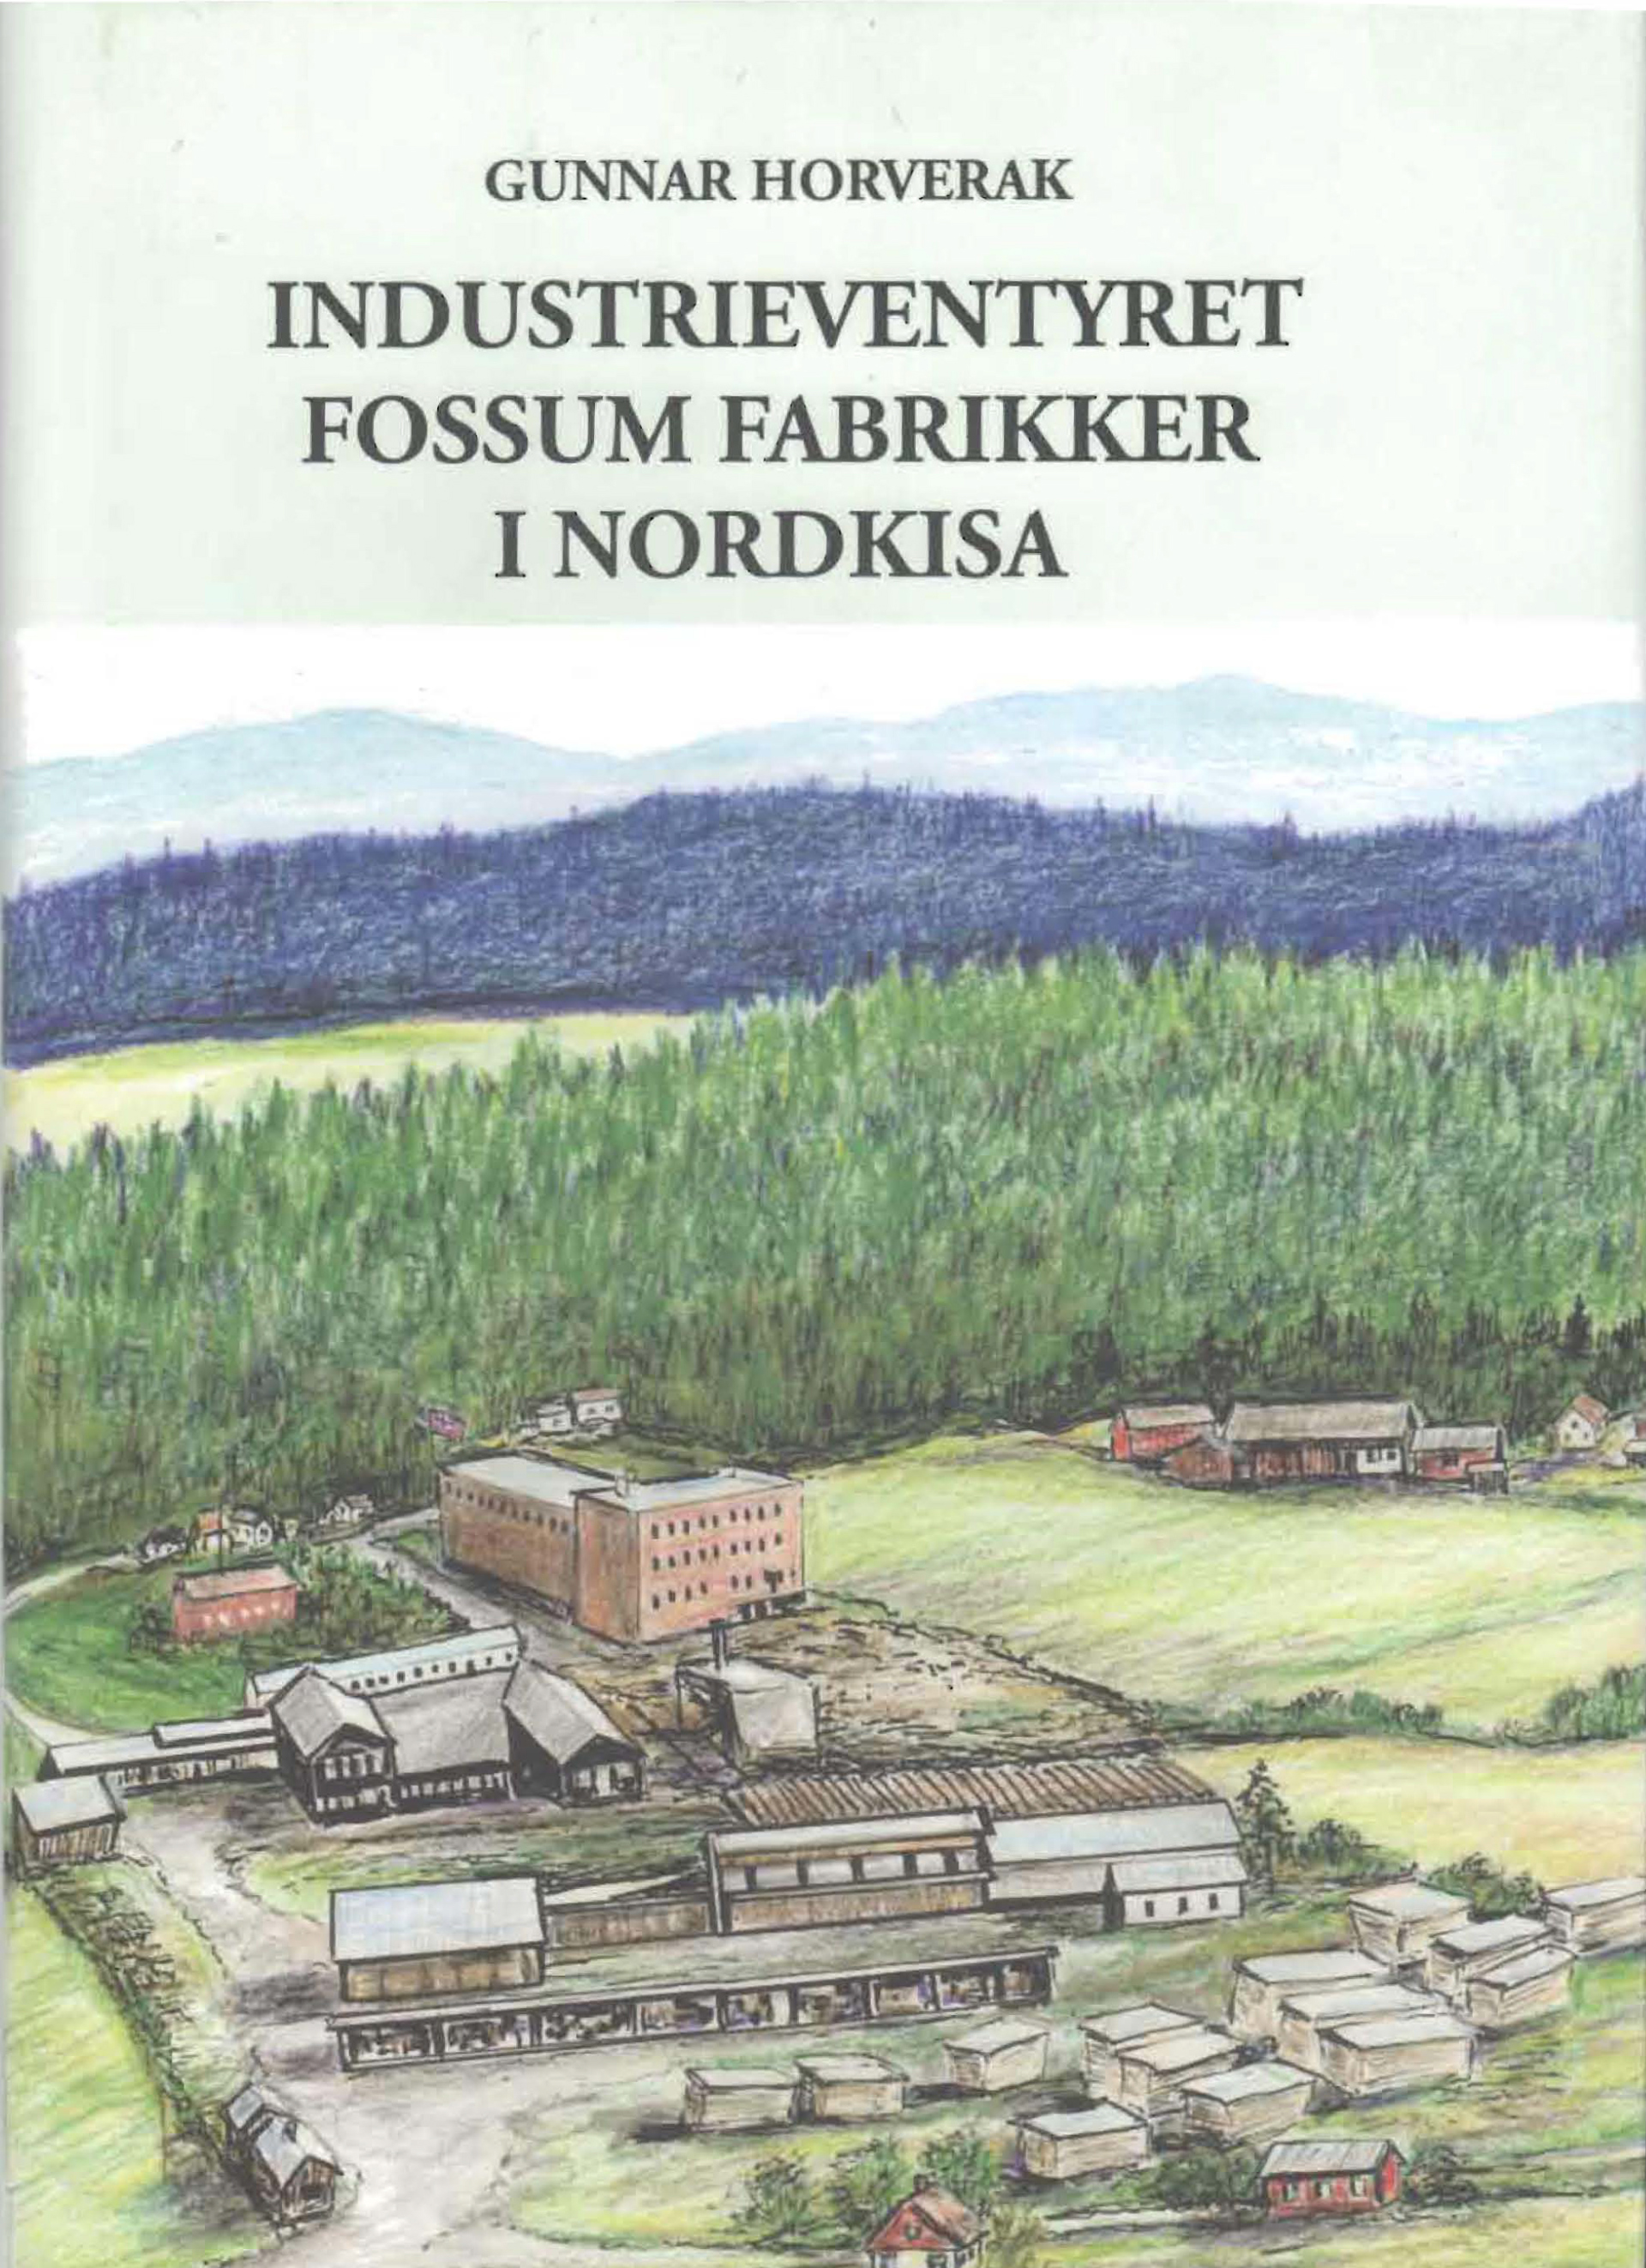 industrieventyret-fossum-fabrikker-nordkisa.jpg